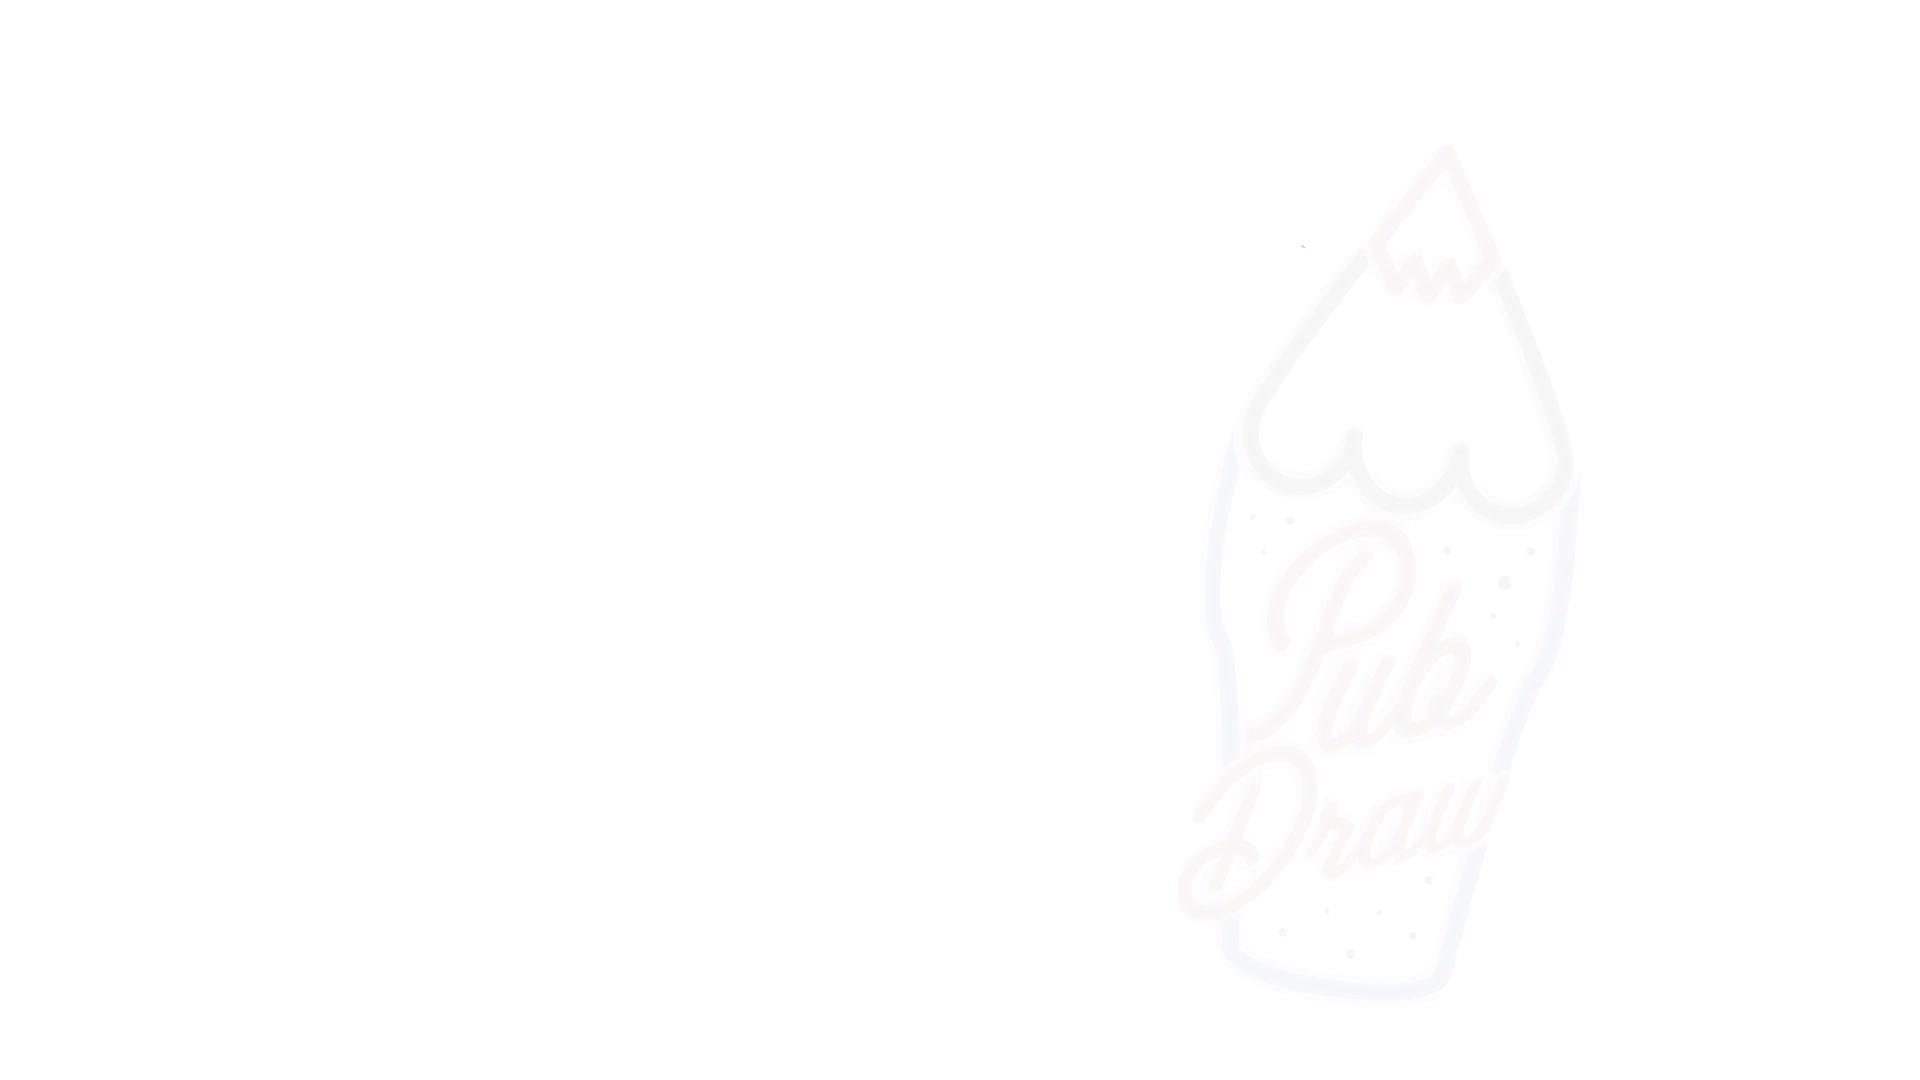 ▷ Crawl-Logo-2 GIF by jabberlockey - Find & Download & Share GIFs